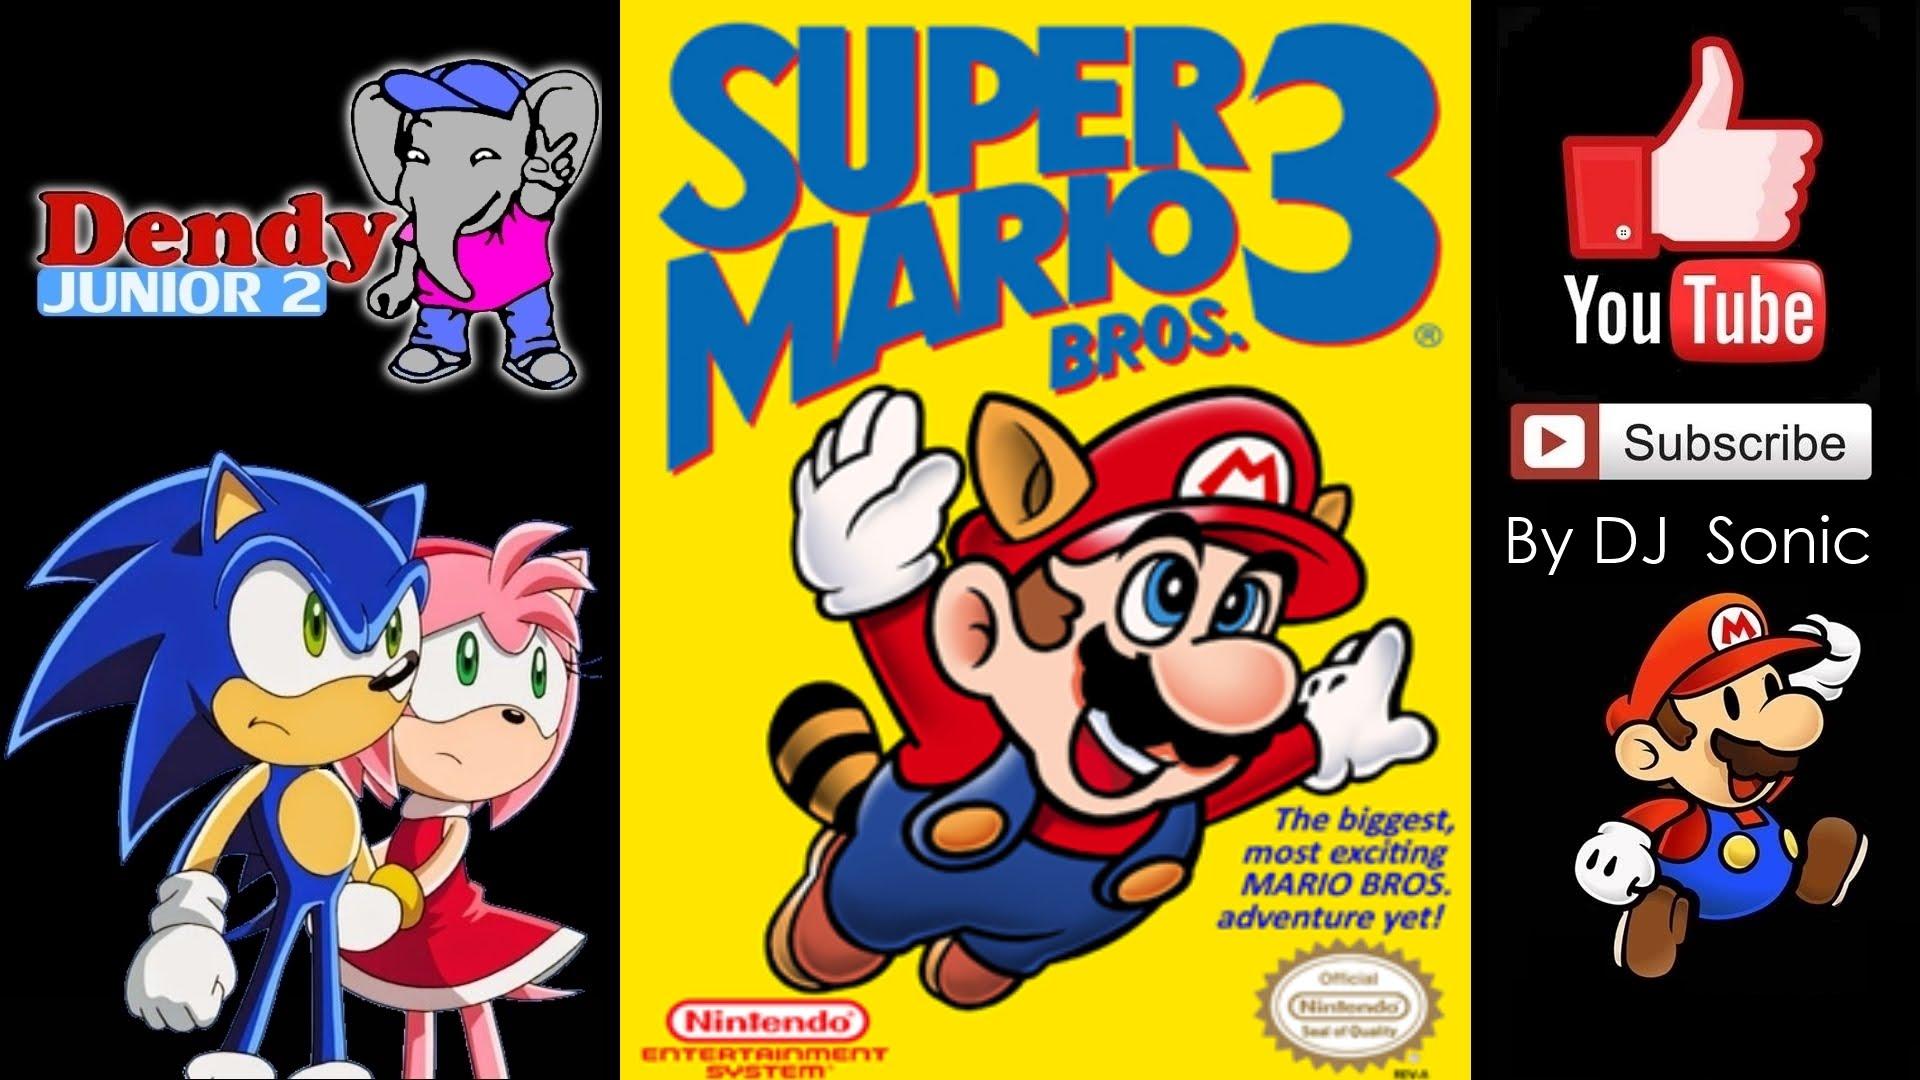 Mario clipart tube Bros 3 (Dendy) Super Super